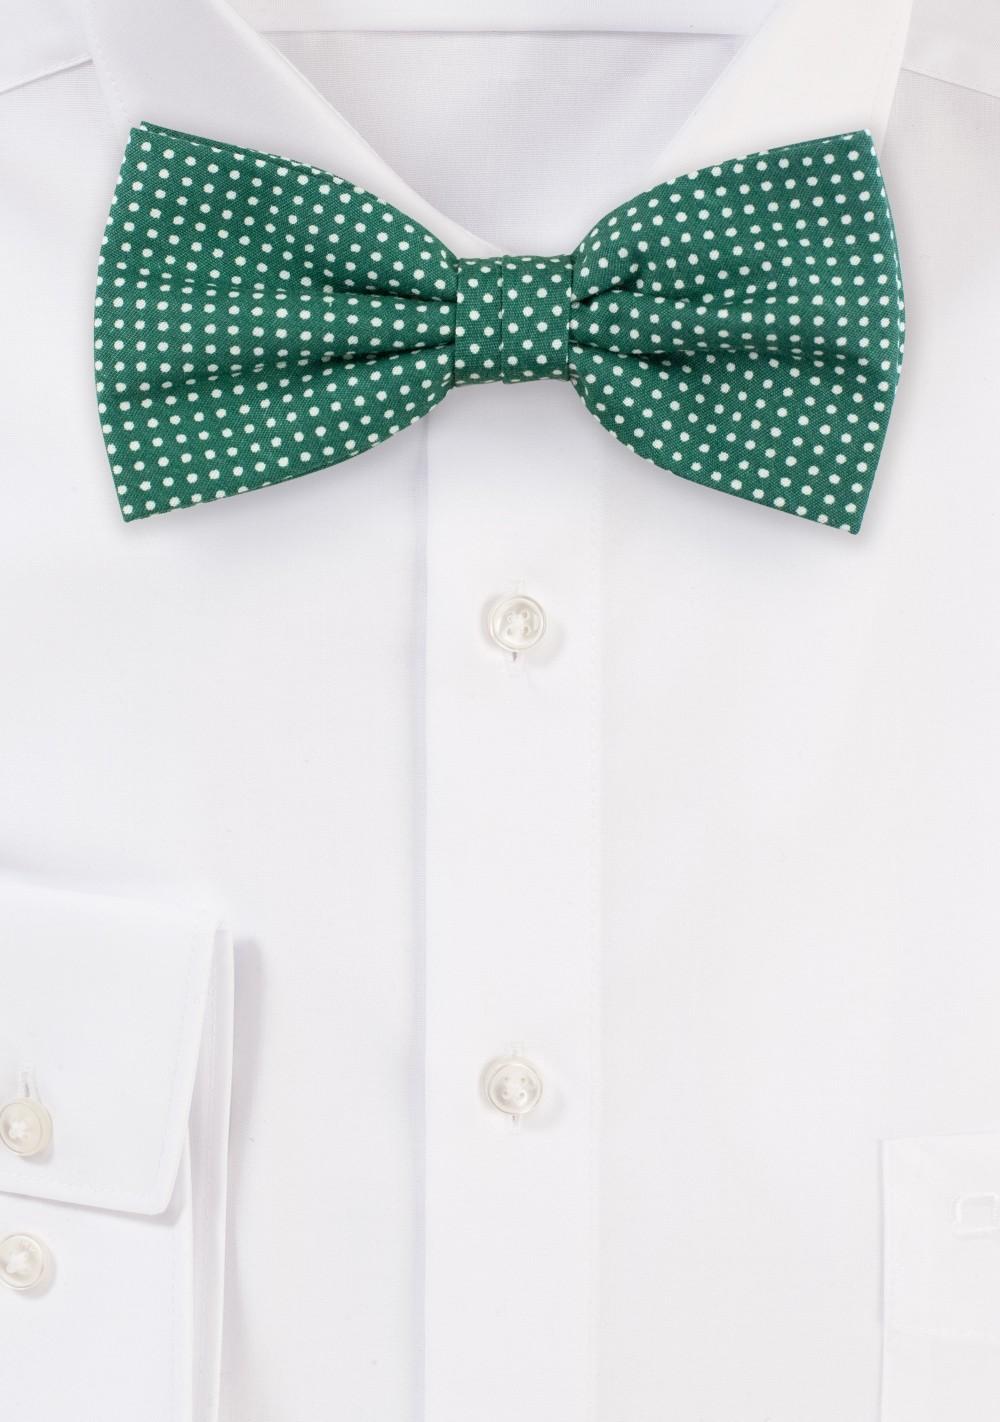 Kelly Green Micro Dot Cotton Bow Tie